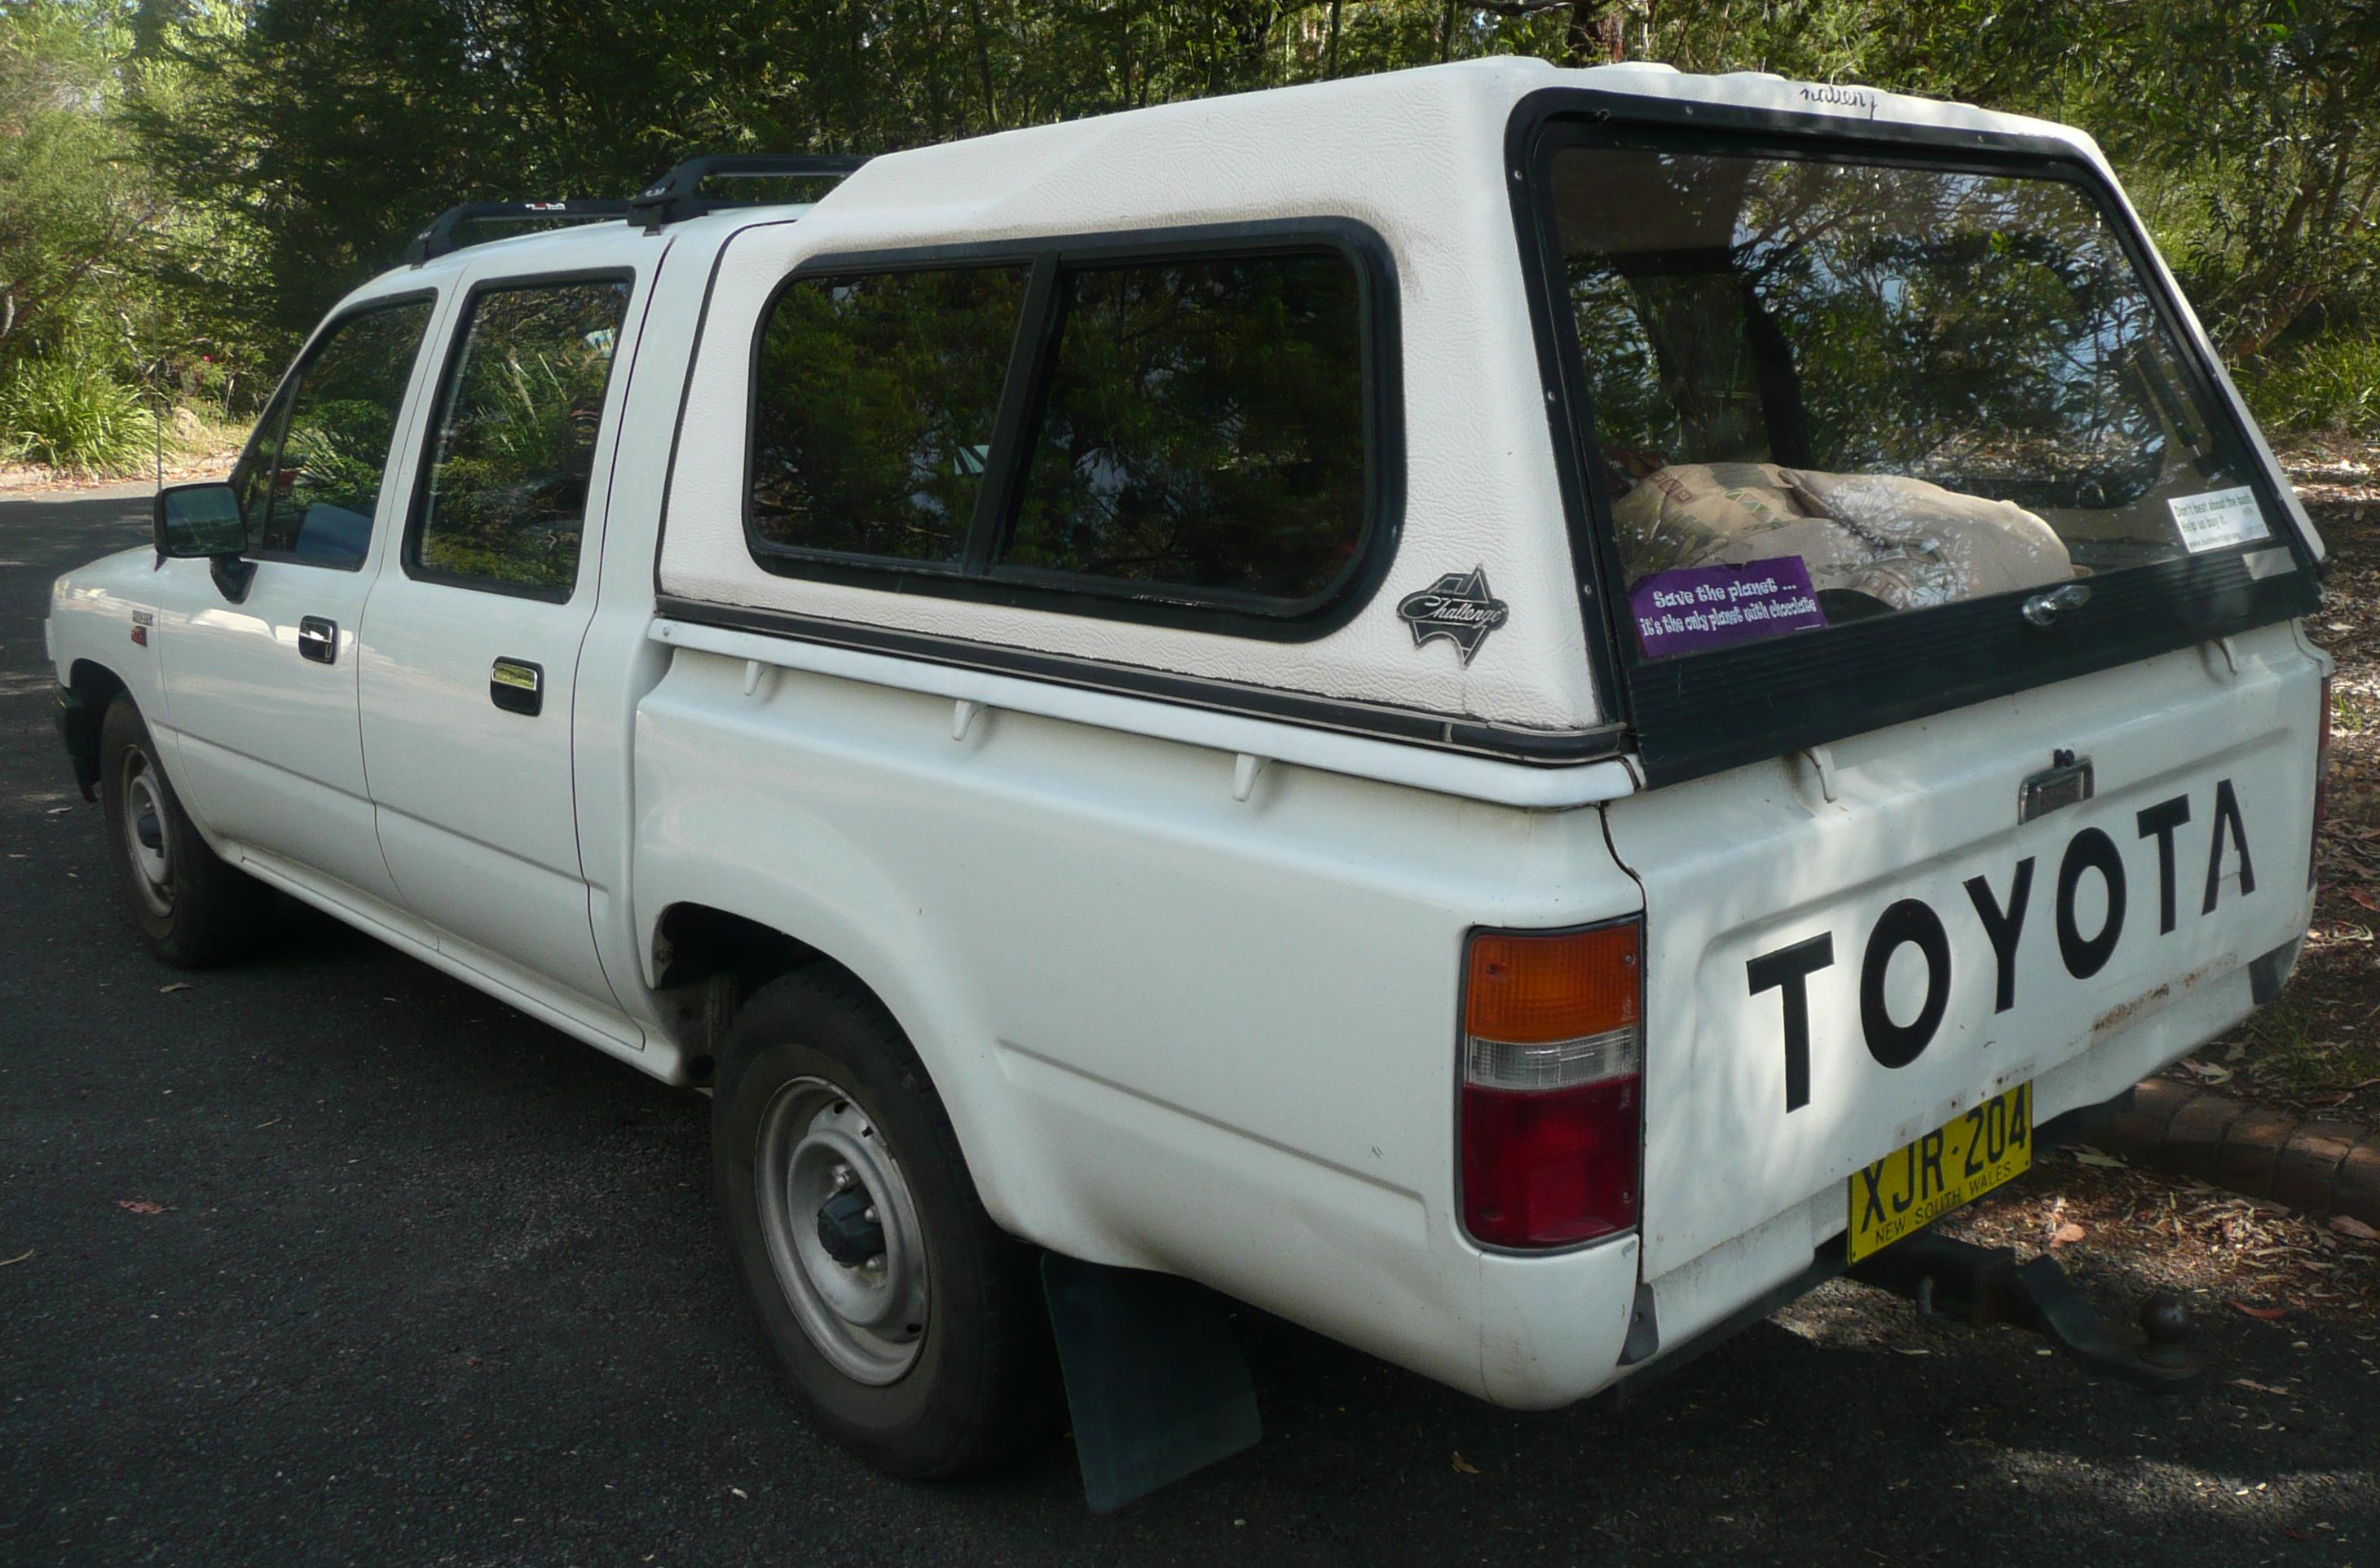 Kelebihan Kekurangan Toyota Hilux 1994 Harga